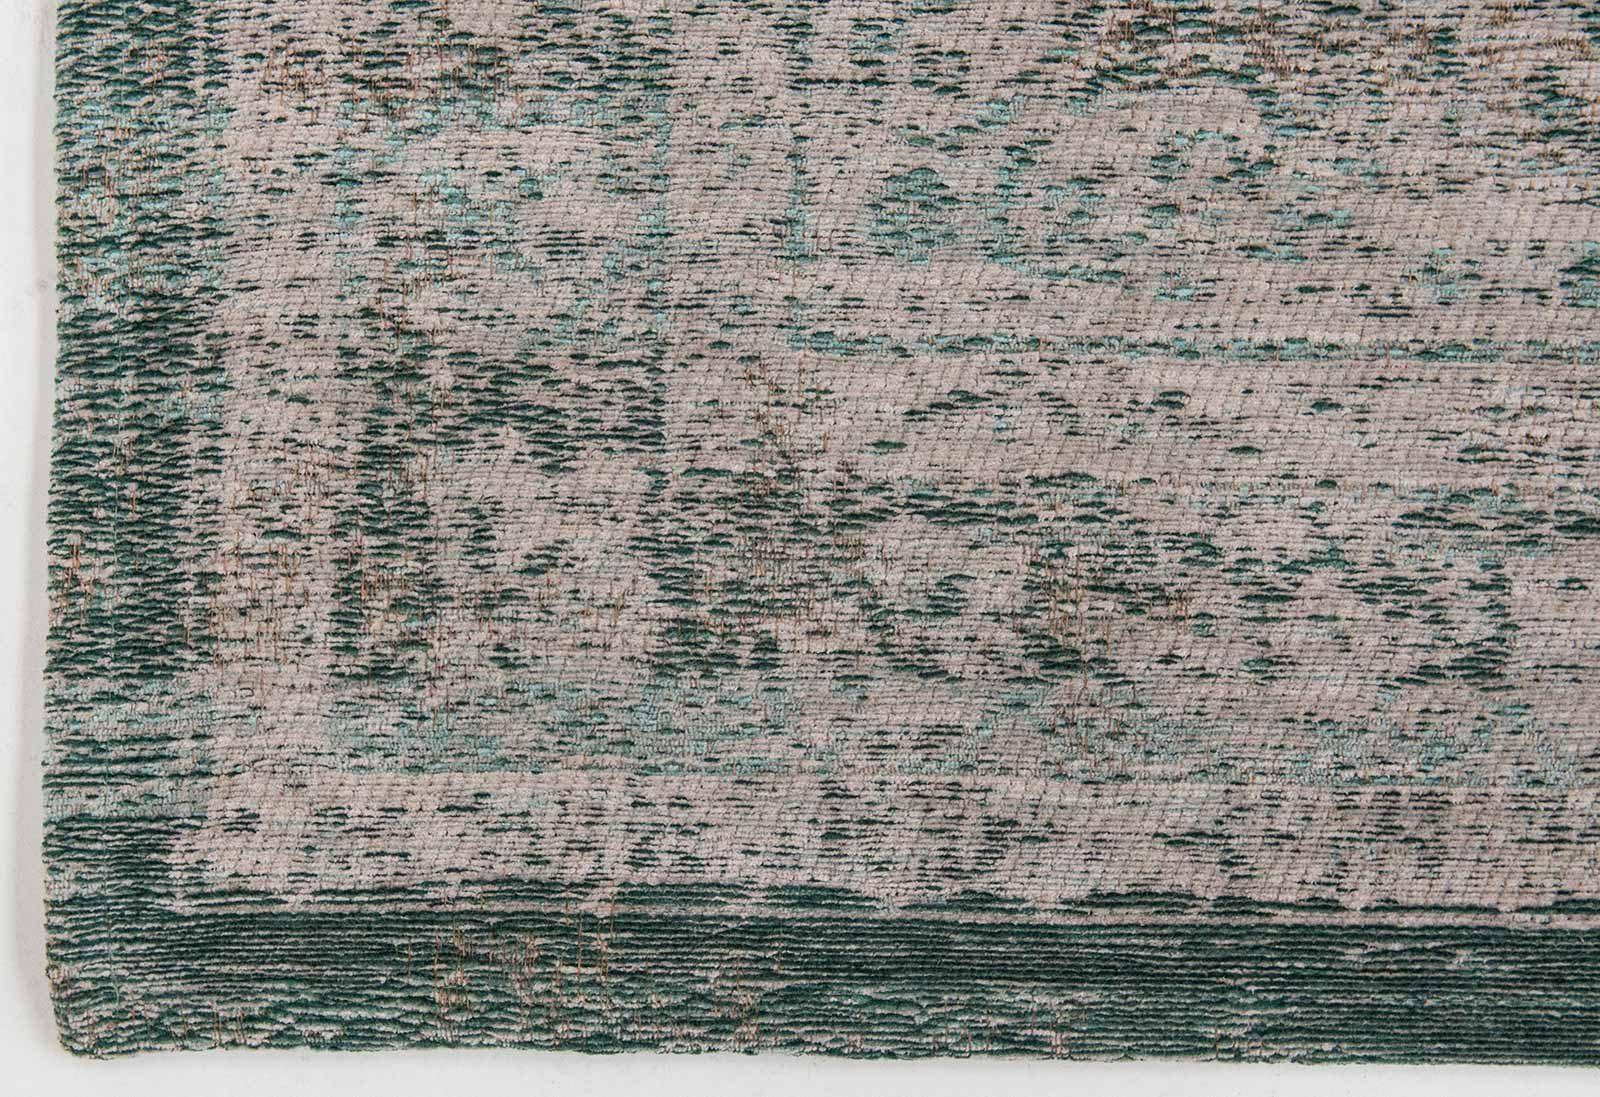 vloerkleed Louis De Poortere CS 8259 Fading World Medaillon Jade Oyster corner